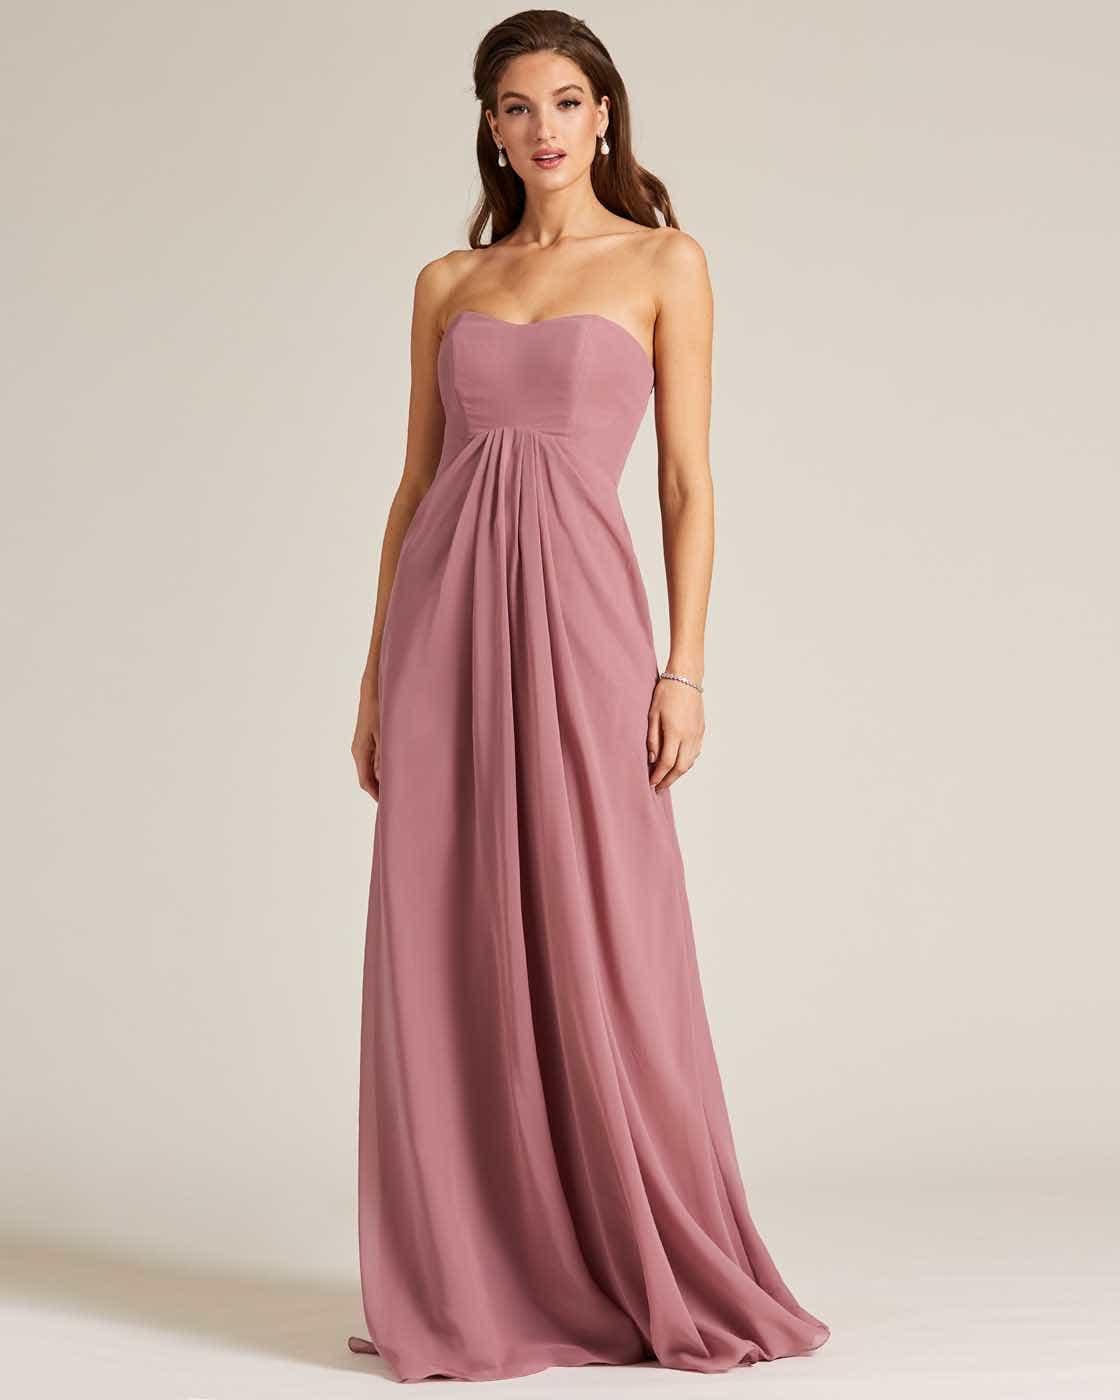 Mauve Strapless Tie Back Evening Dress - Front